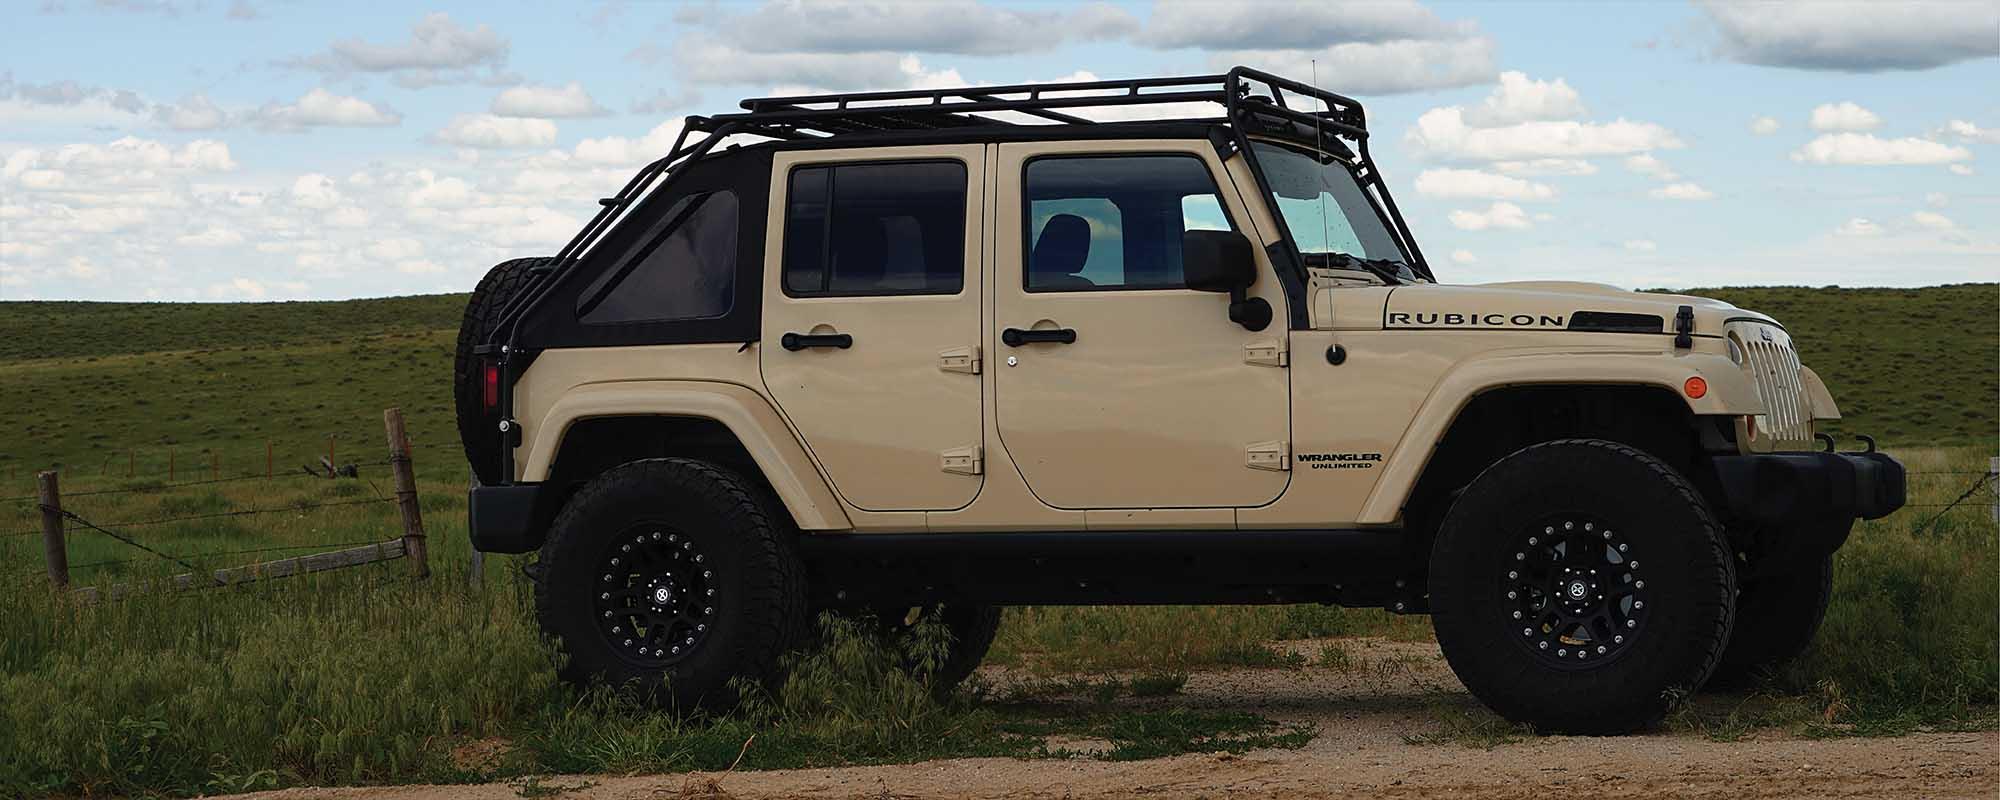 Gobi Roof Racks Jeep Wrangler Jk45 Stealth Rack Side